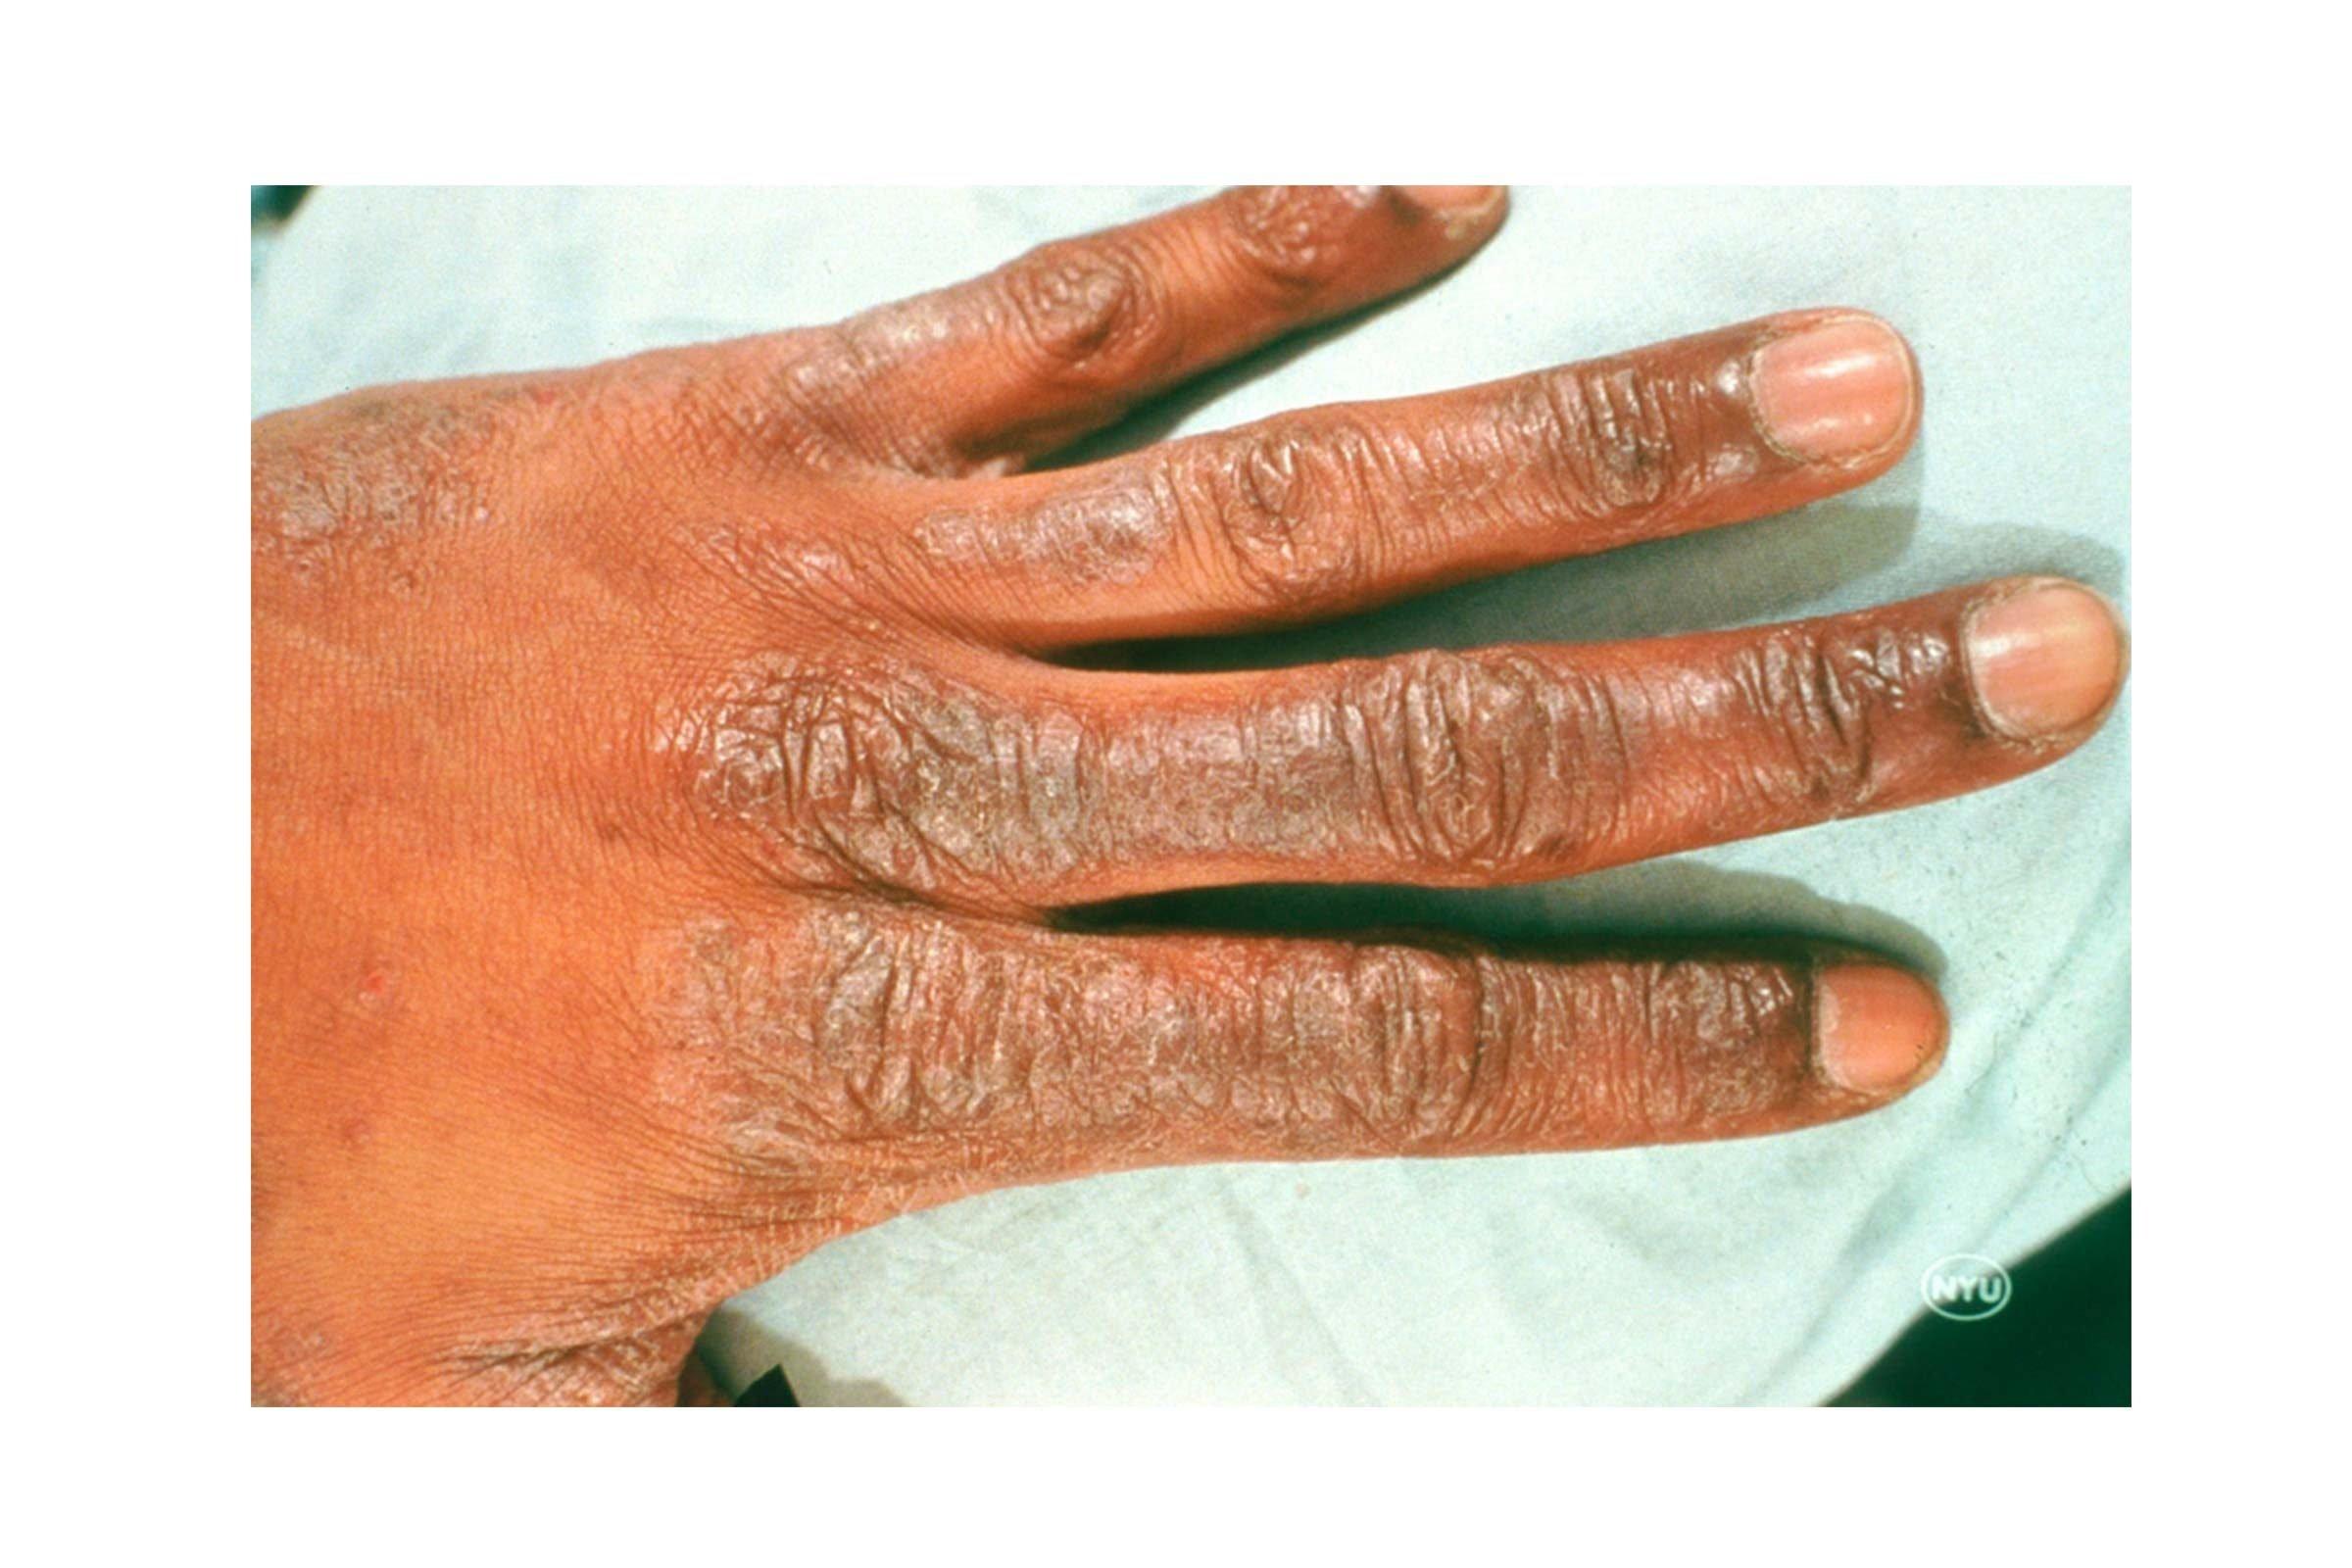 Varieties of Eczema | Types of Eczema | National Eczema ...